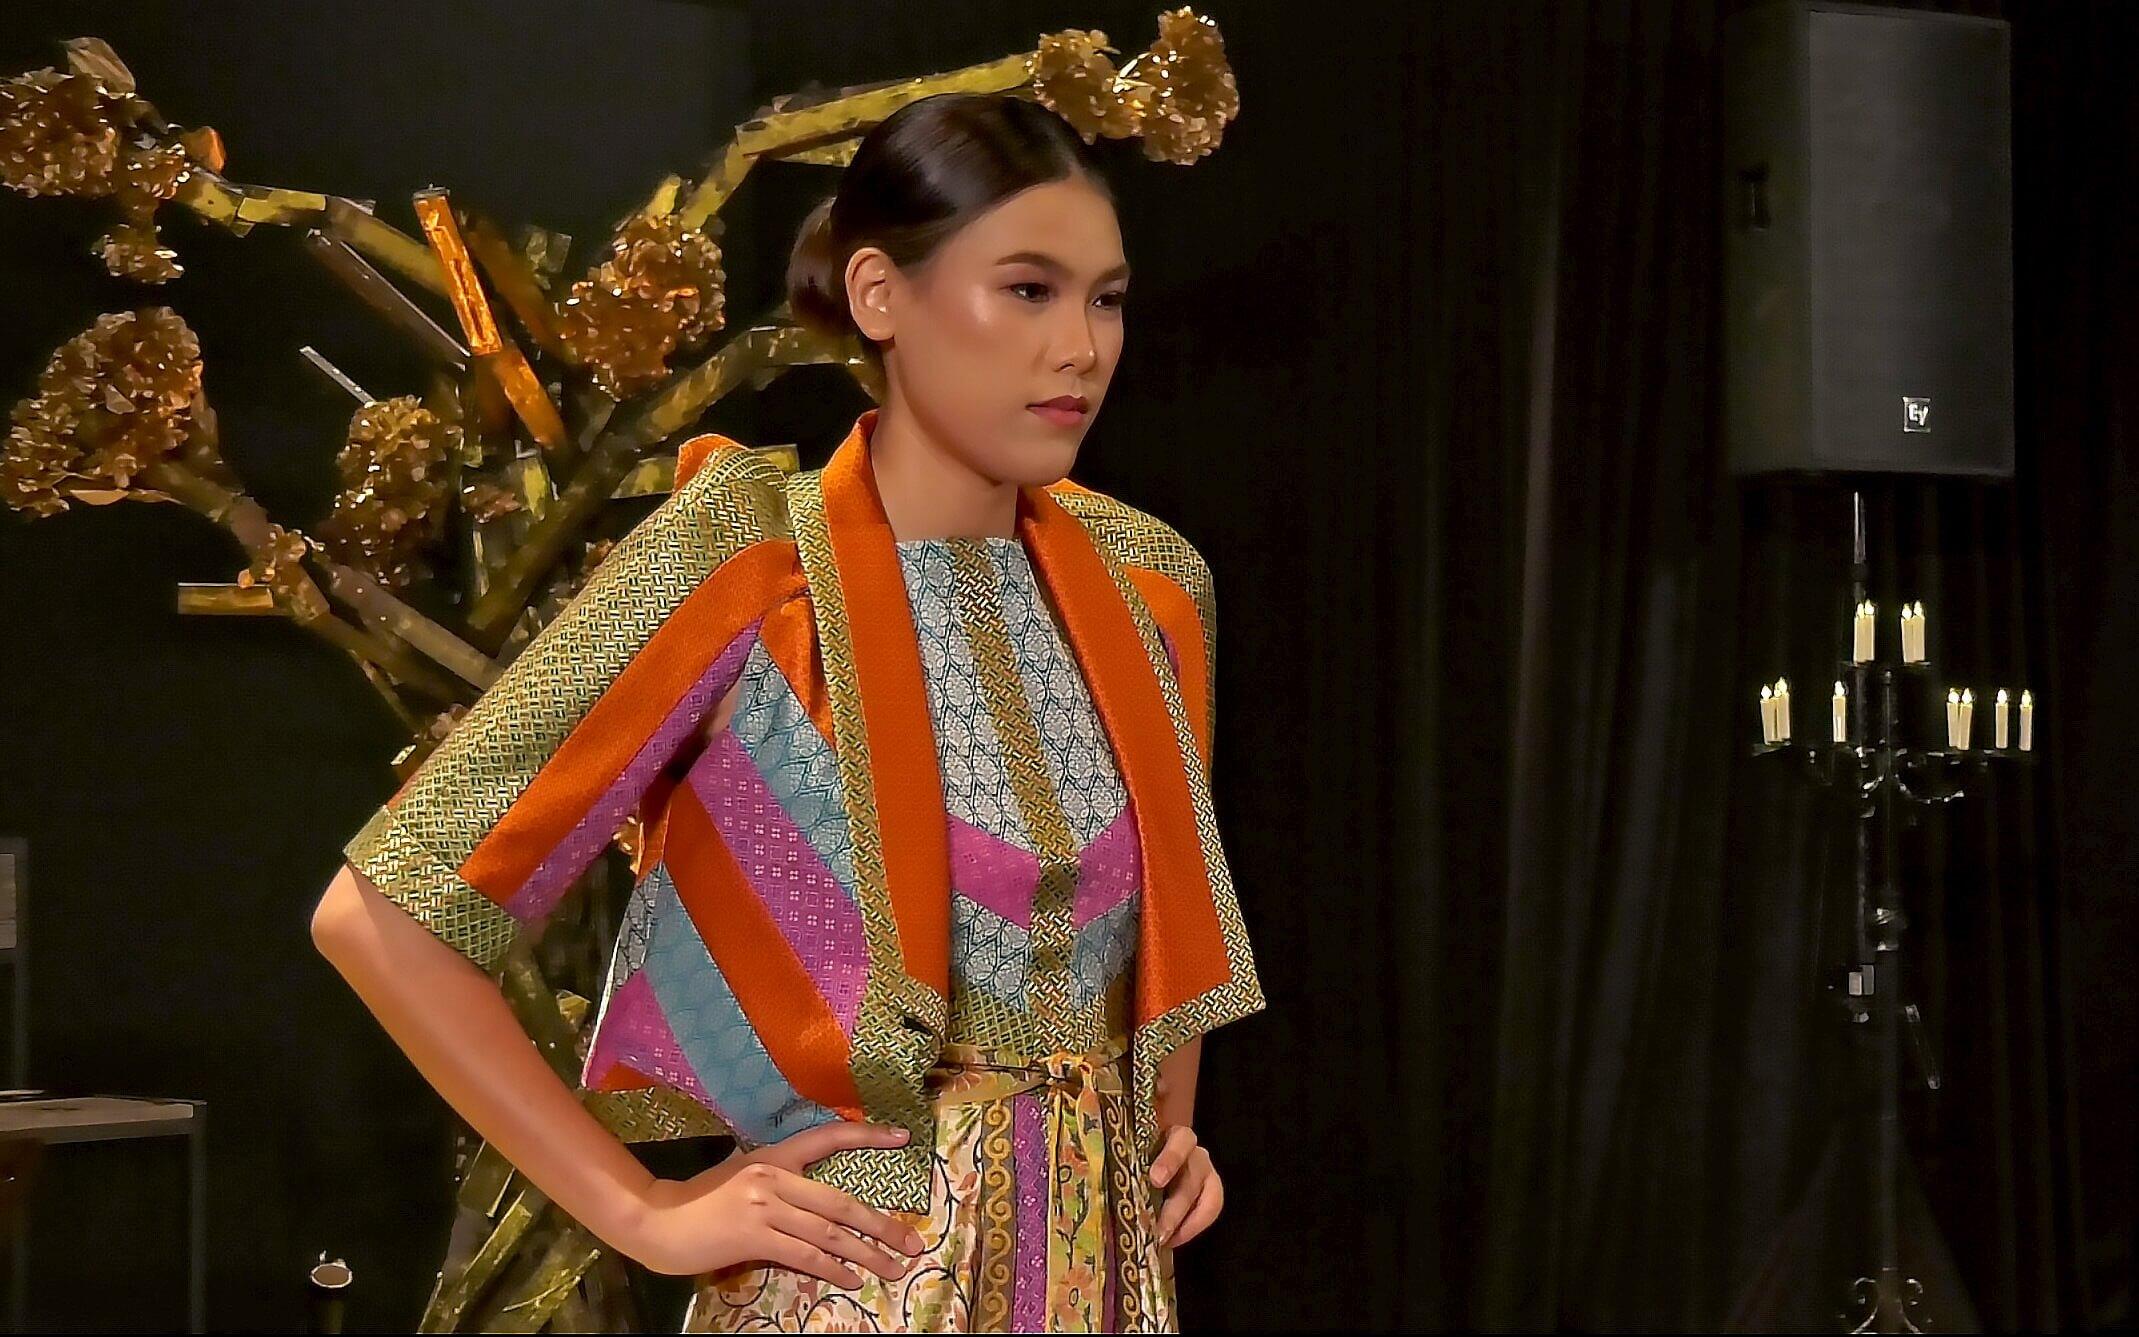 Arab Street URA Raffles Recreating the Textile Culture Collaboration from One Kampung Glam Cahaya Ramadan Live Stream Fashion Show 9